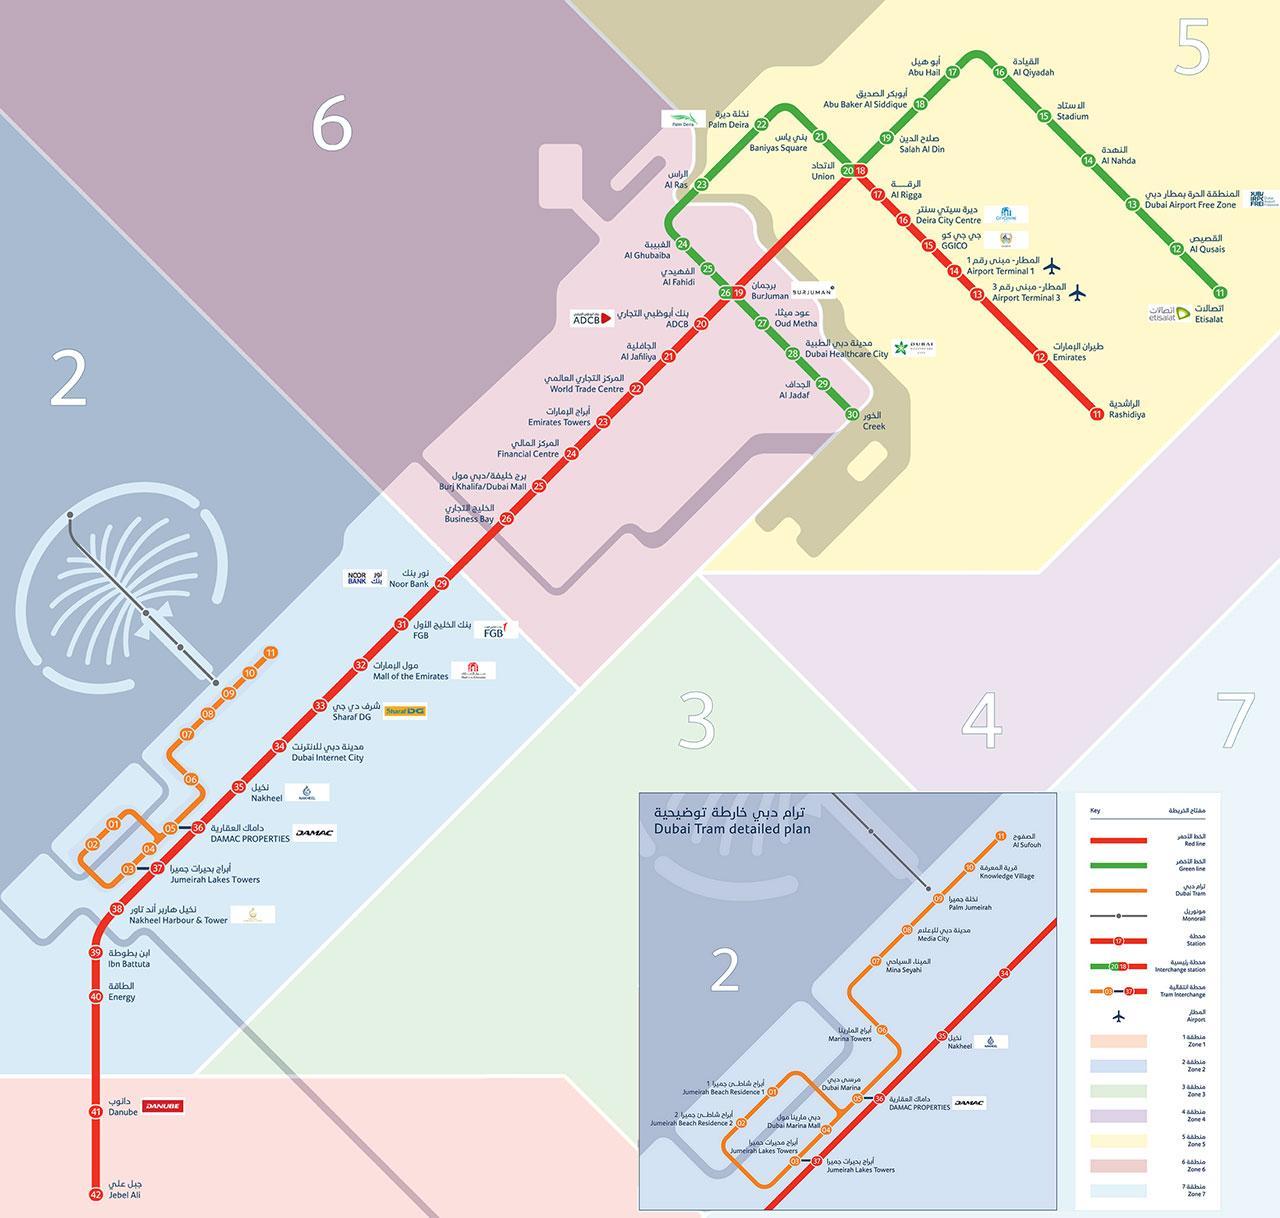 Dubai Subway Map.Dubai Subway Map Subway Map Dubai United Arab Emirates